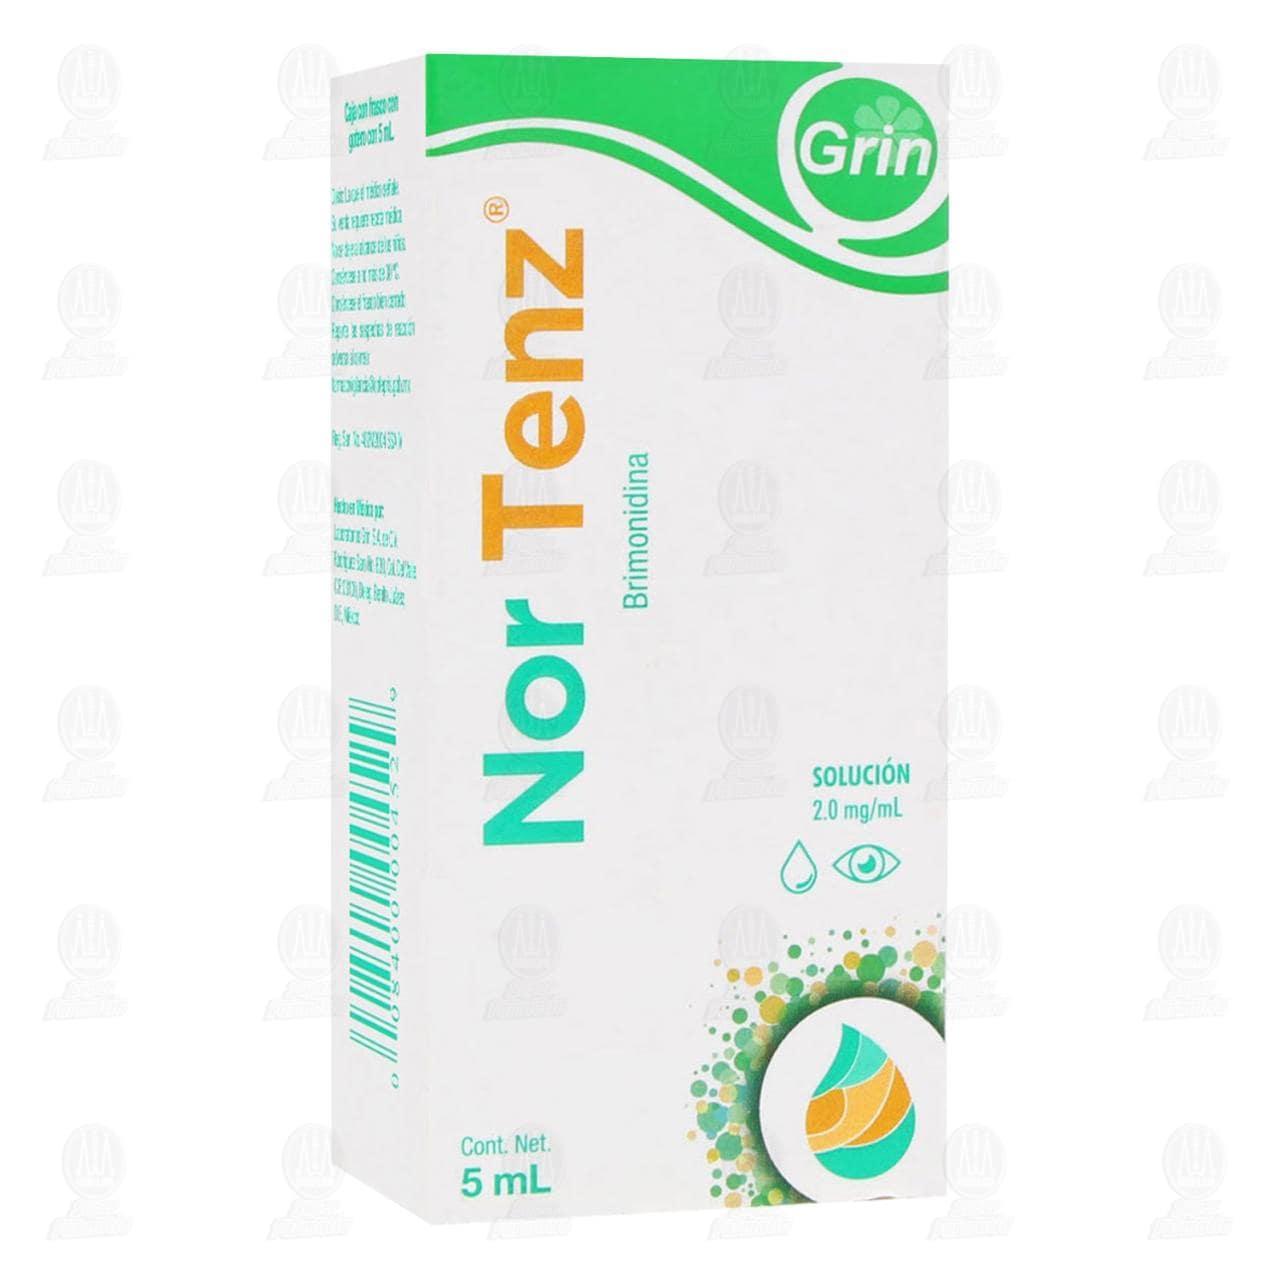 Comprar Nor Tenz 2.0mg 5ml Solución Oftálmica en Farmacias Guadalajara